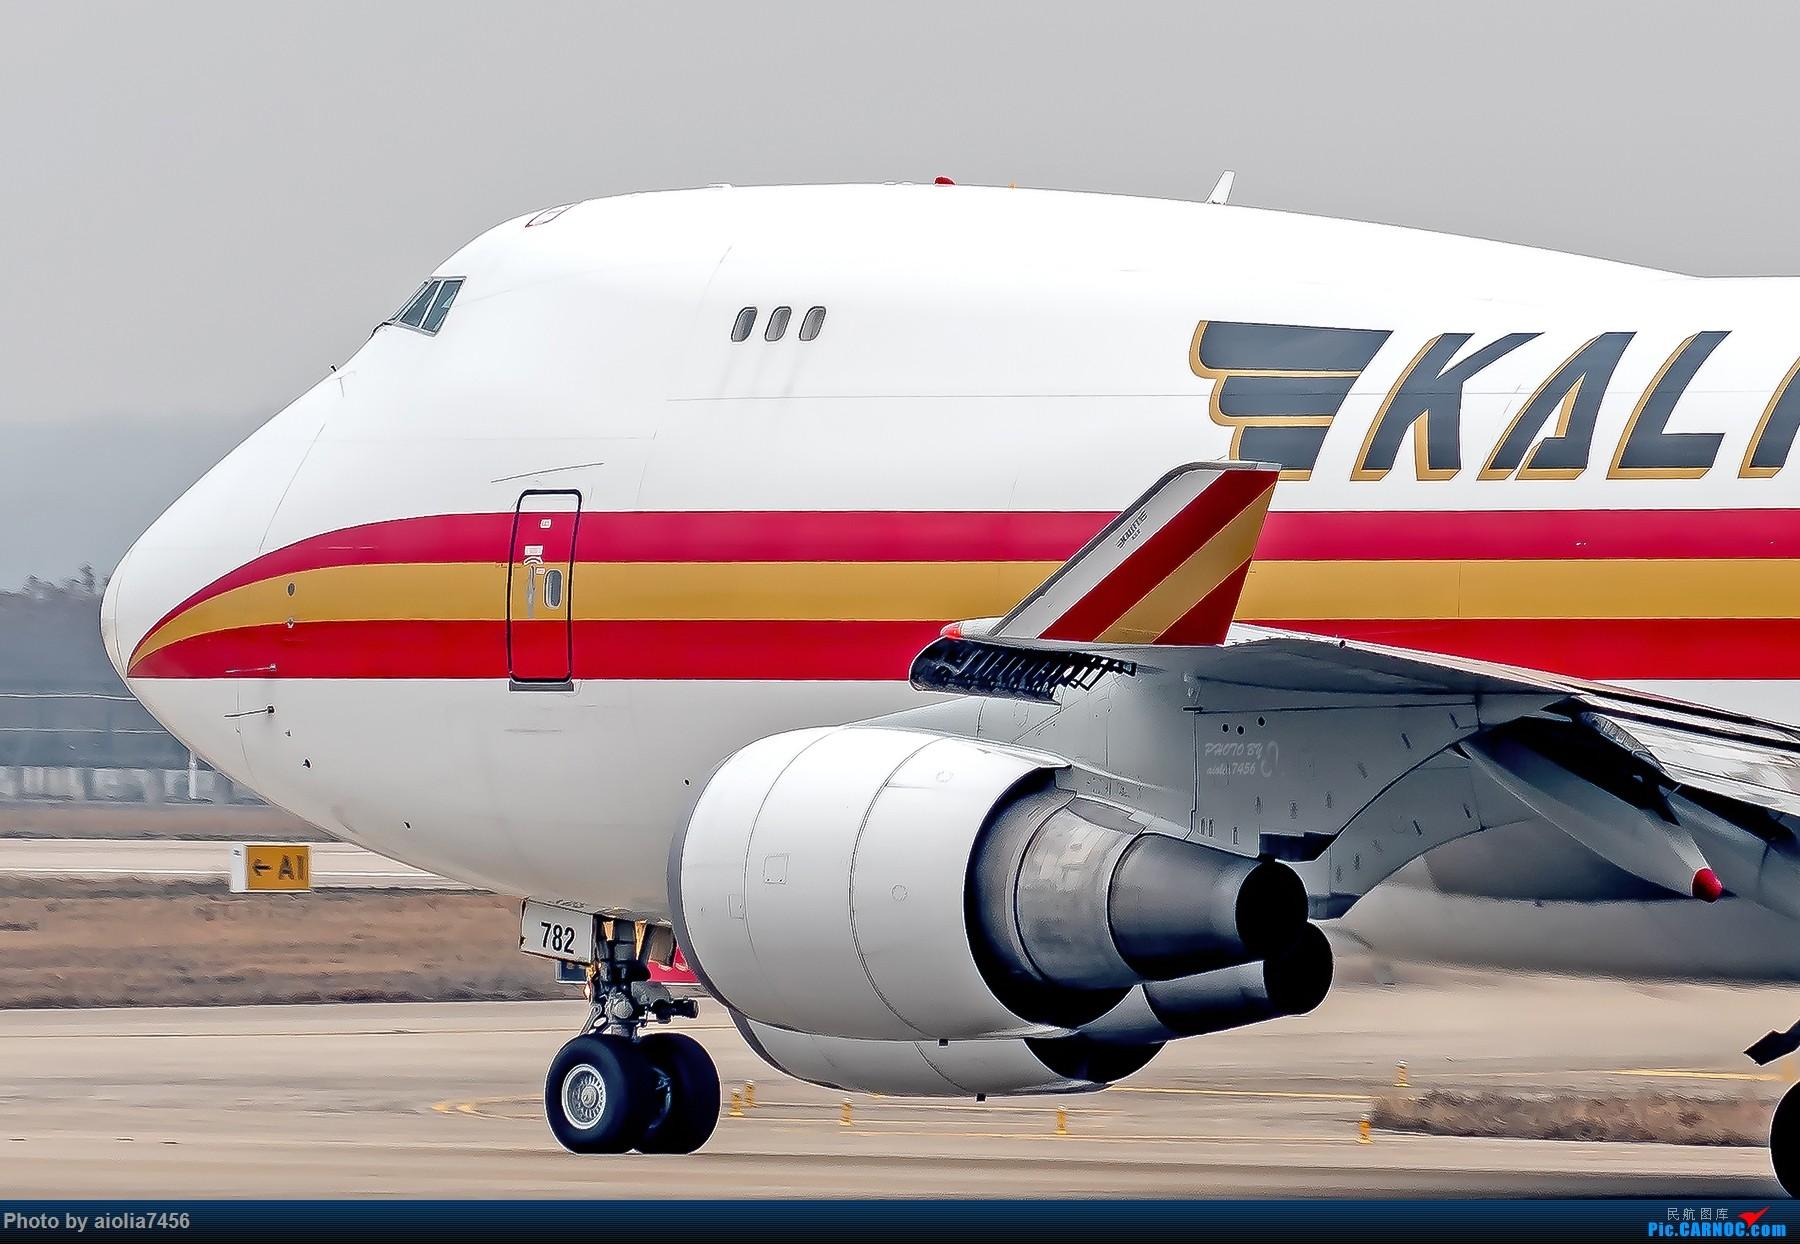 Re:[原创]【合肥飞友会】记述小确幸的霸都新桥,和记述着这些小确幸的霸都飞友 BOEING 747-400F N782CK 中国合肥新桥国际机场